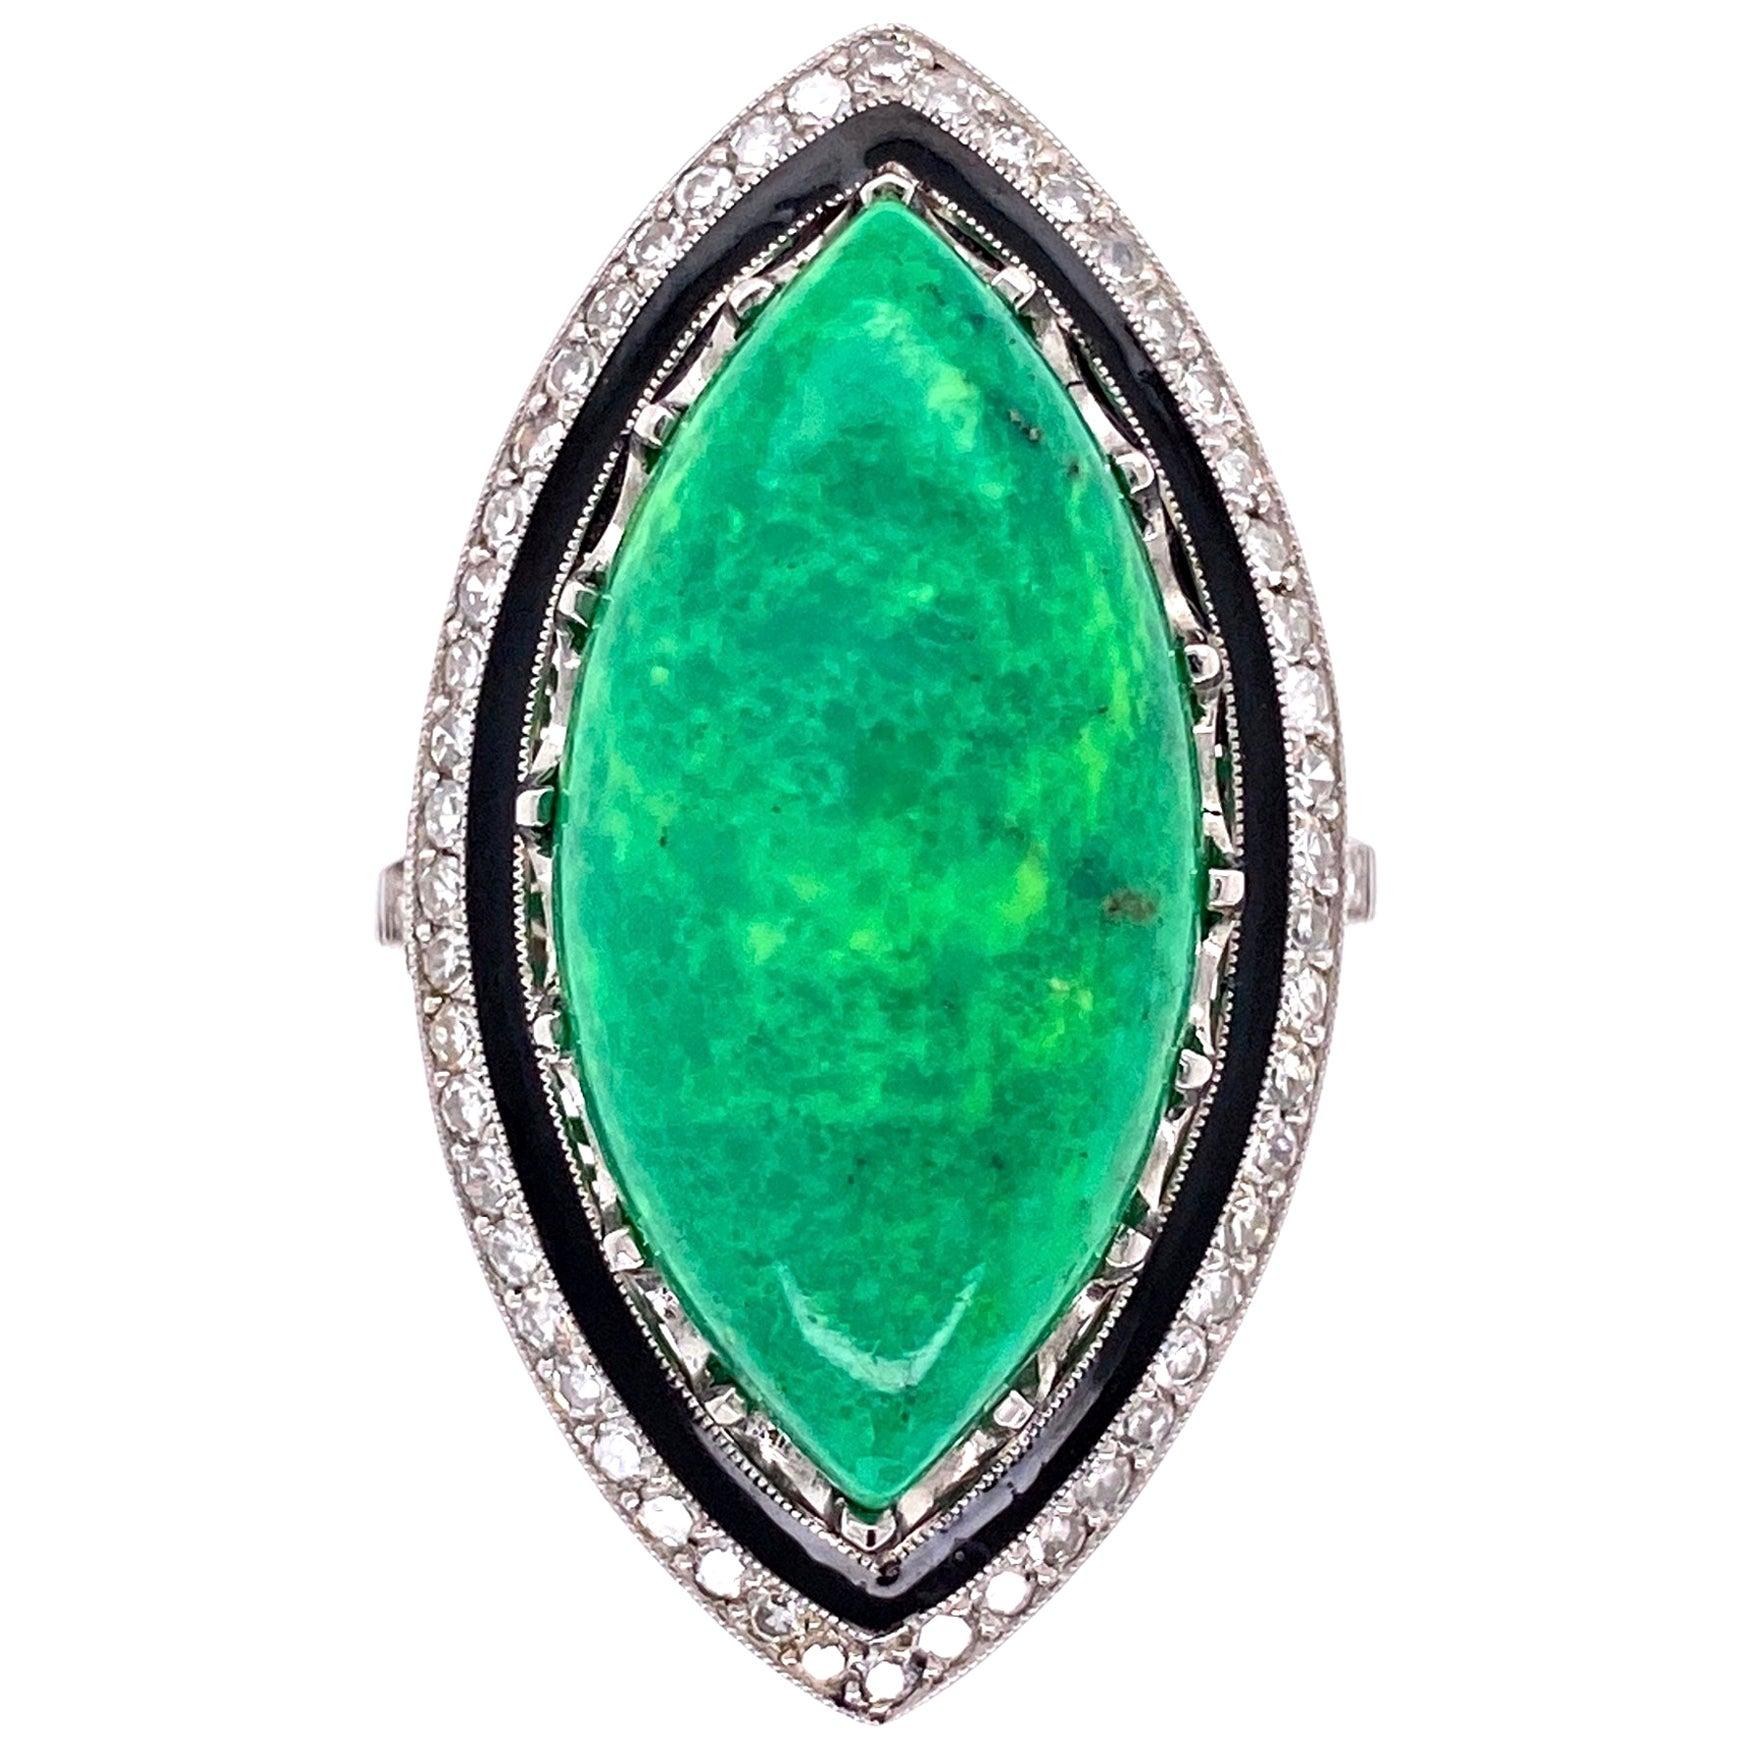 Art Deco Style Turquoise Enamel and Diamond Platinum Ring Estate Fine Jewelry